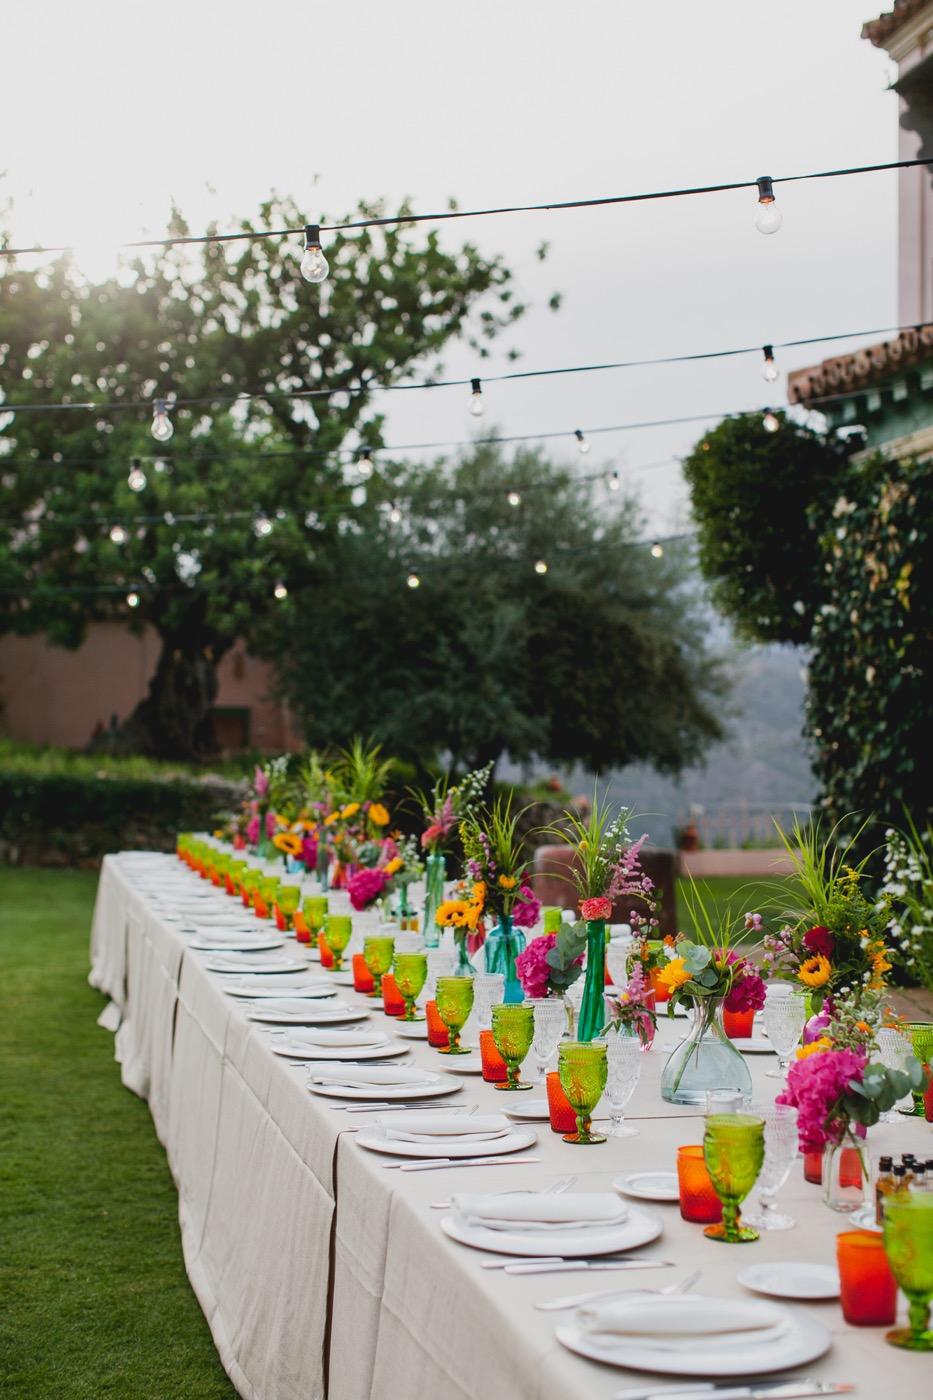 Si-Quiero-Wedding-Planner-By-Sira-Antequera-Bodas-Málaga-Marbella-Miami- PATRICIA-JUANLU-1